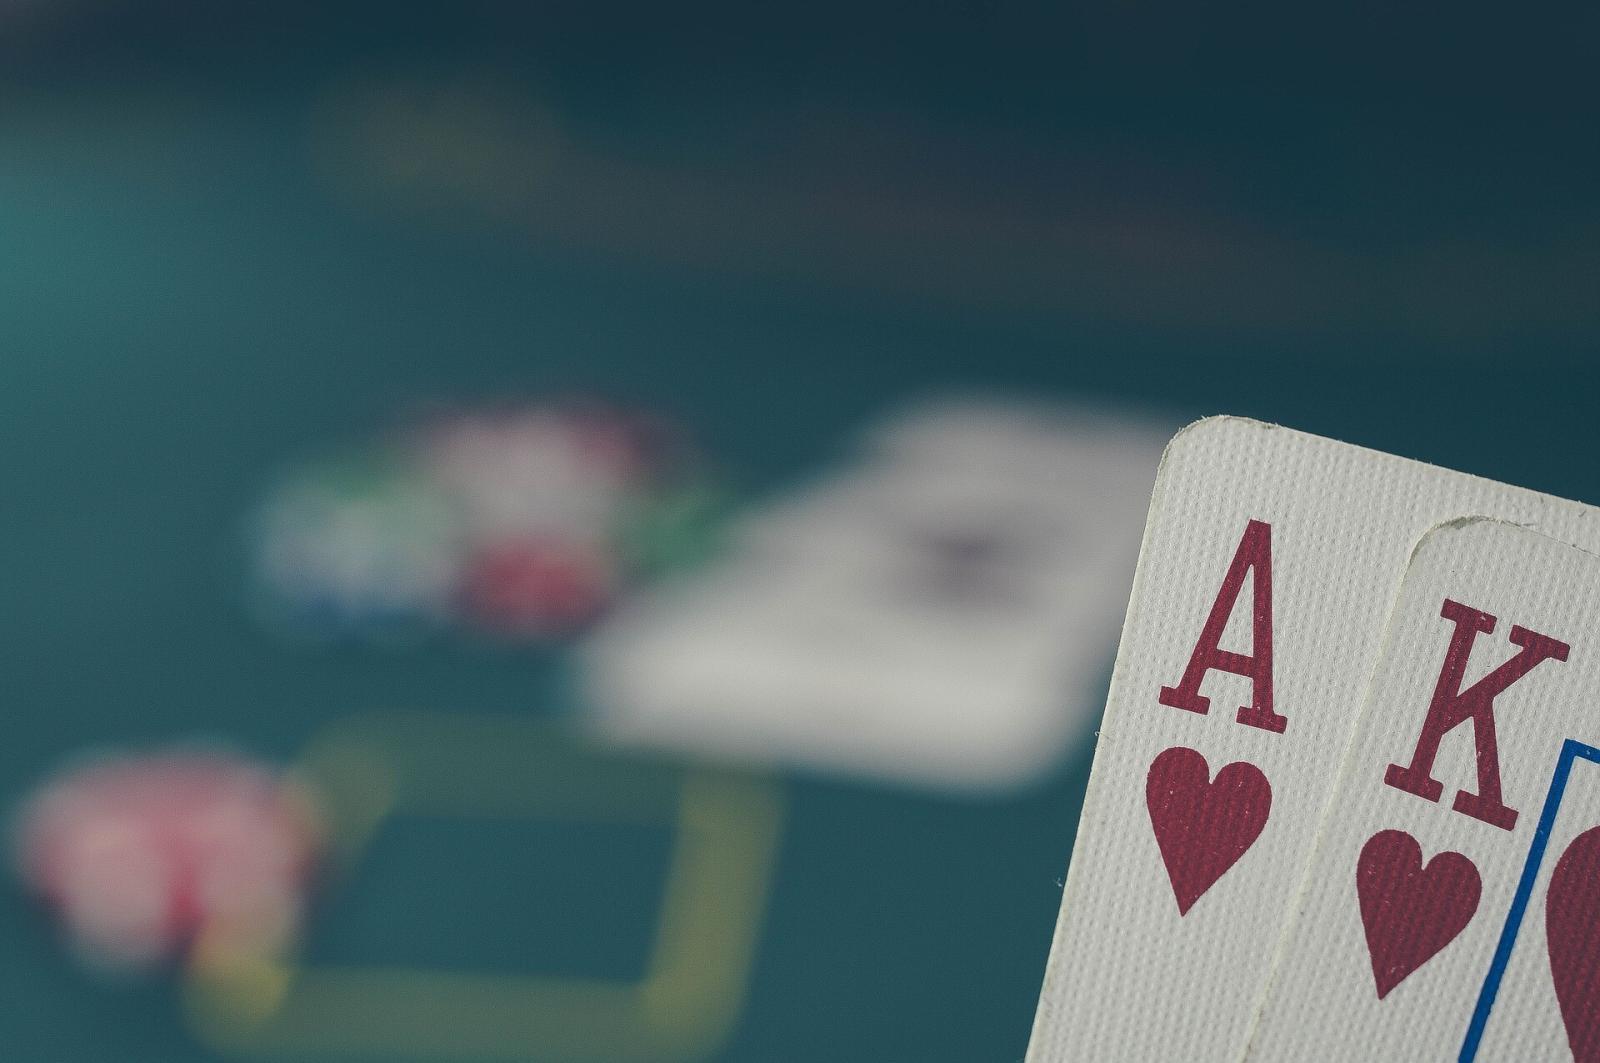 stratégie poker